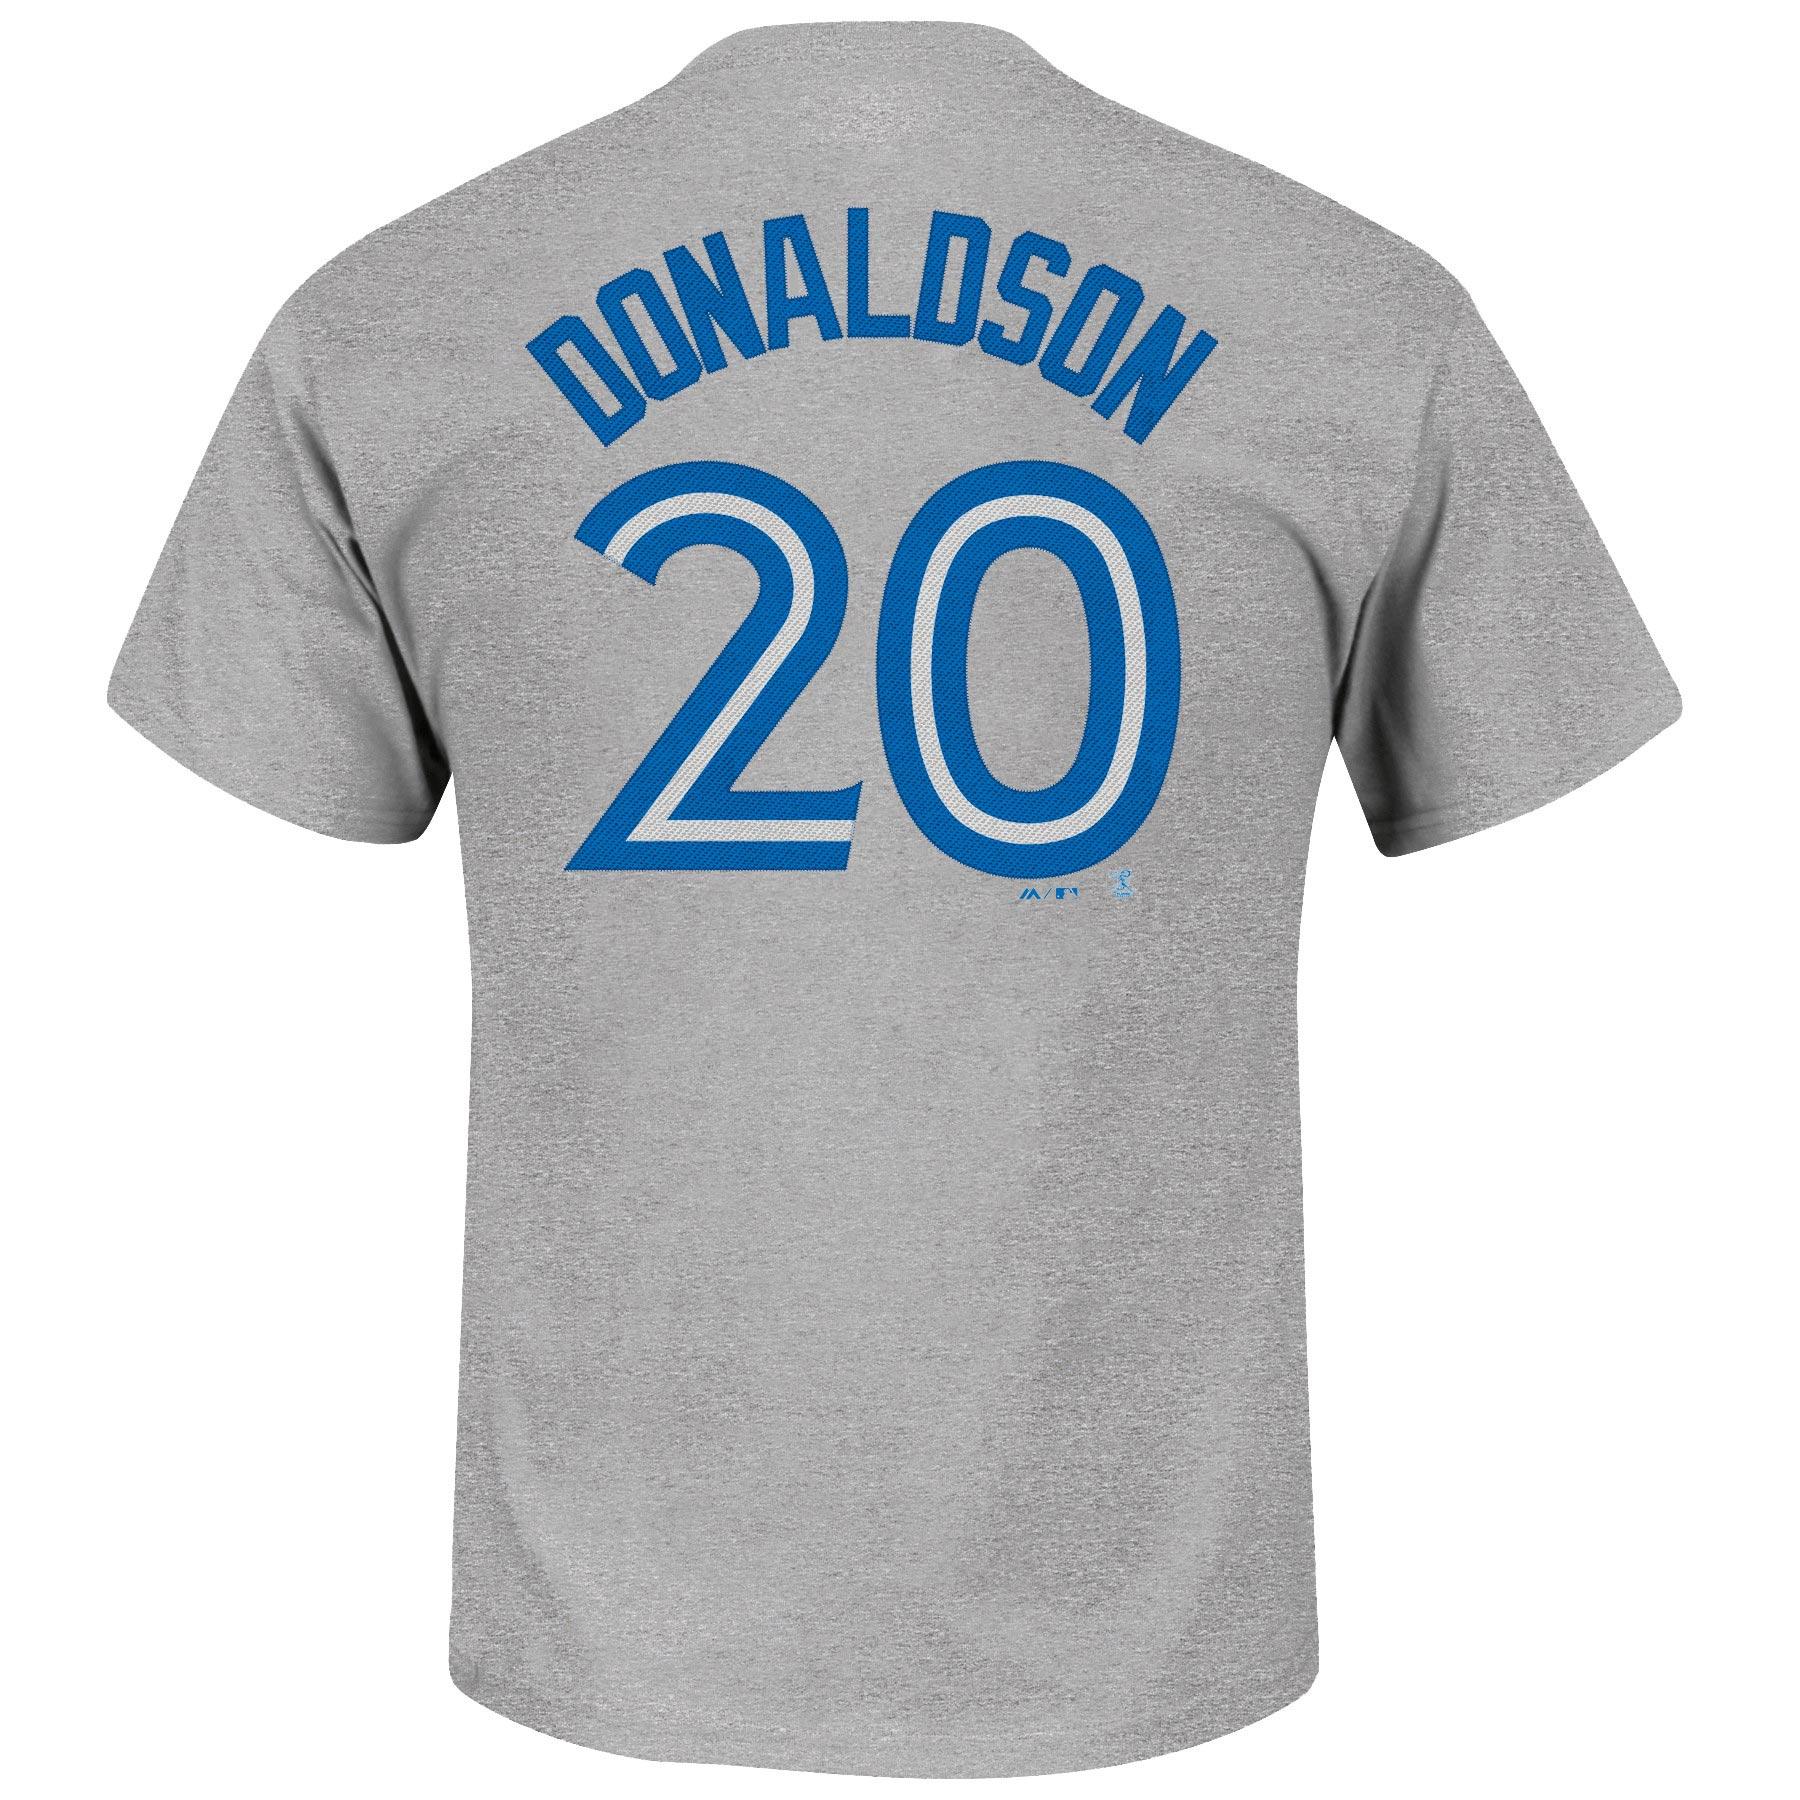 purchase cheap 4656a fc97e Toronto Blue Jays Josh Donaldson MLB Player Name & Number Road T-Shirt  (Gray)